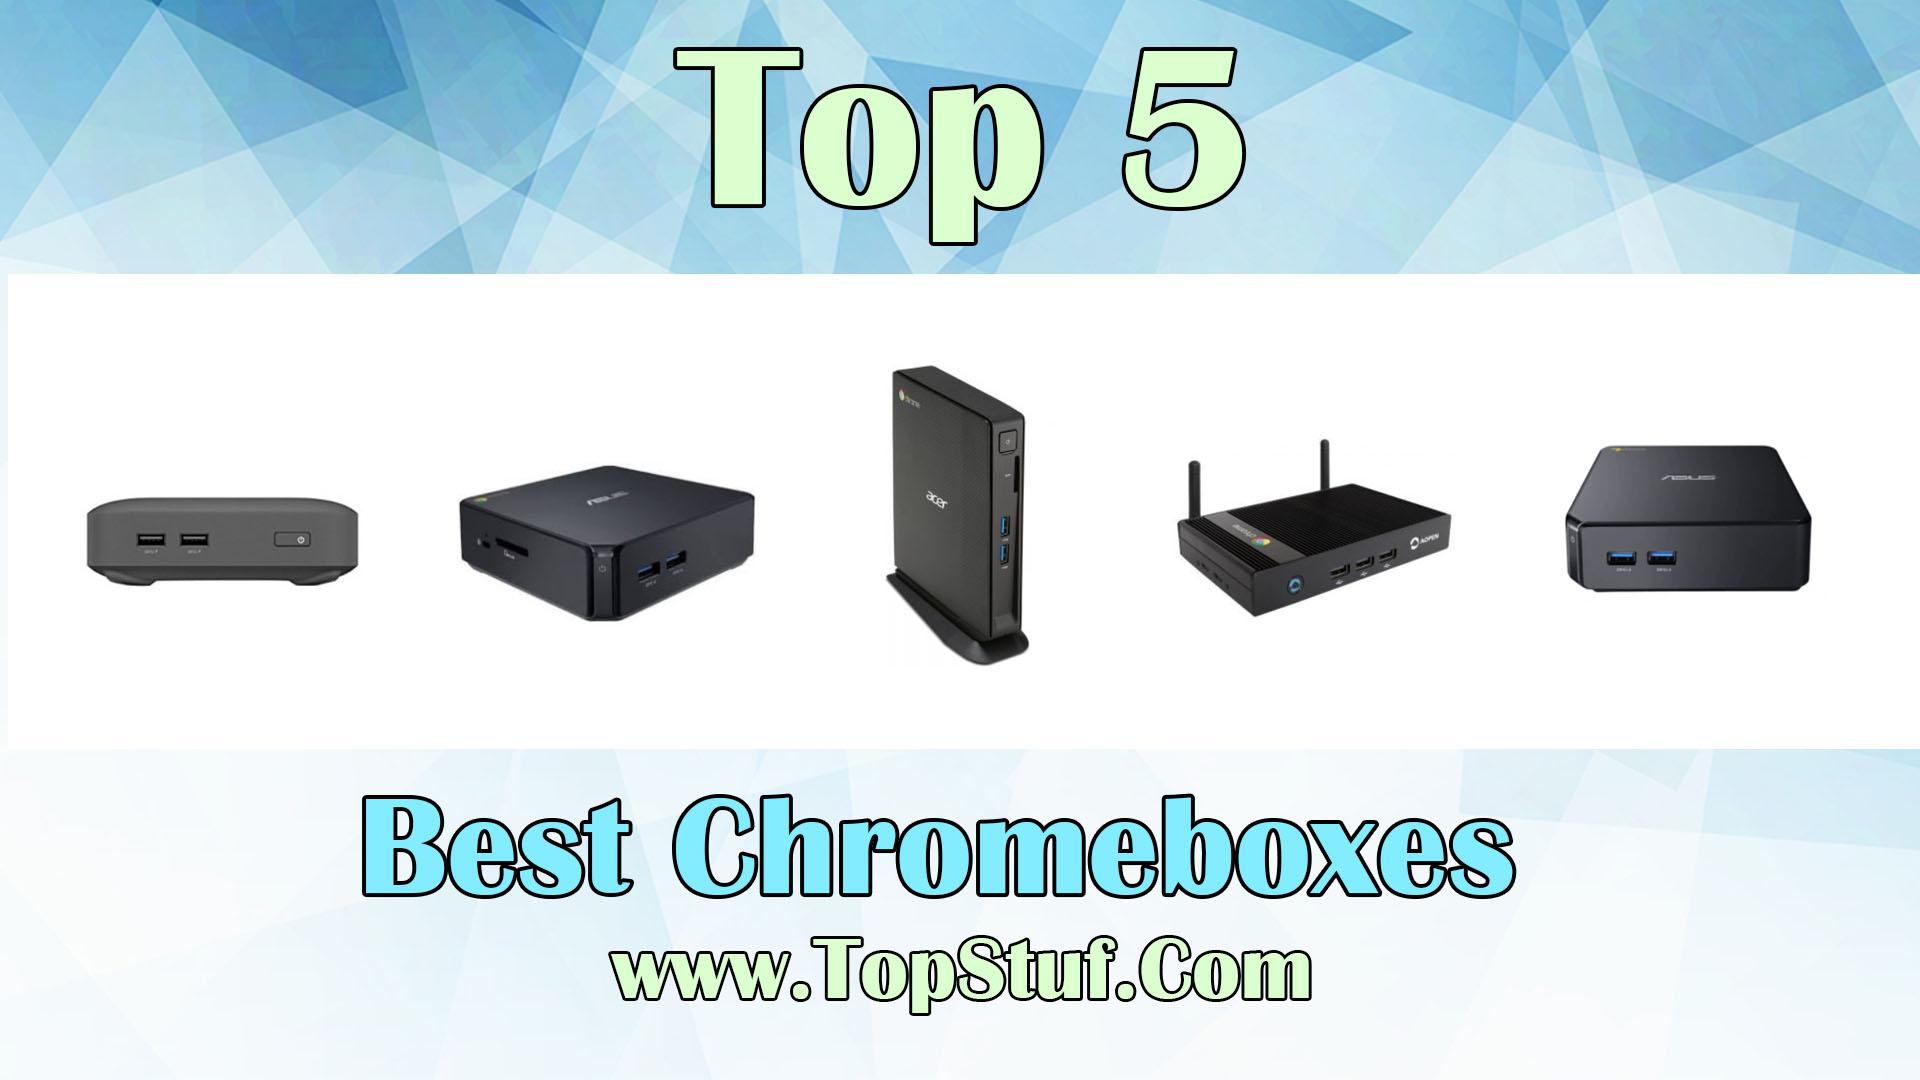 Best Chromeboxes